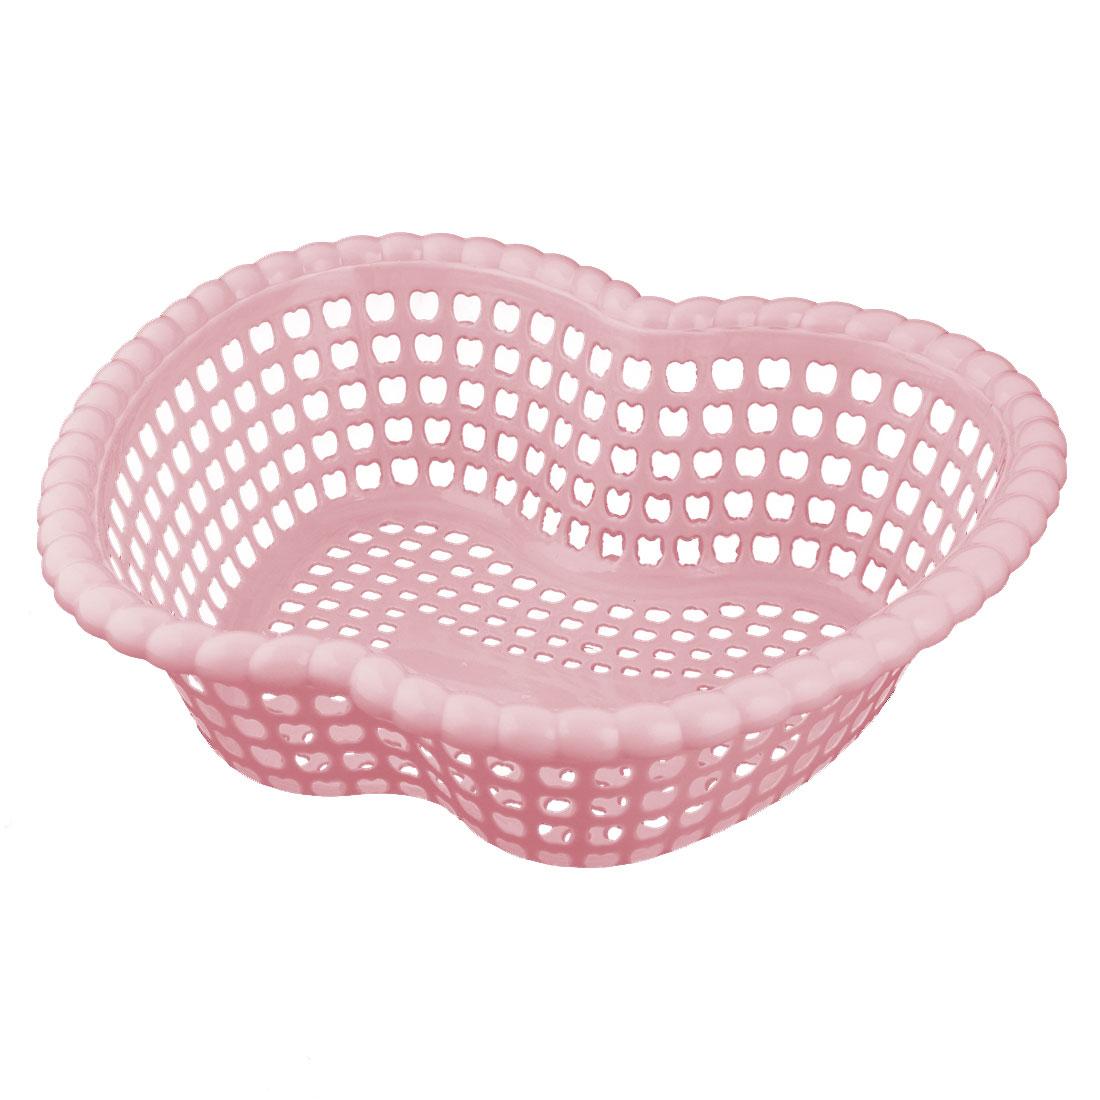 Family Plastic Apple Shaped Fruit Vegetable Holder Washing Basket Strainer Pink